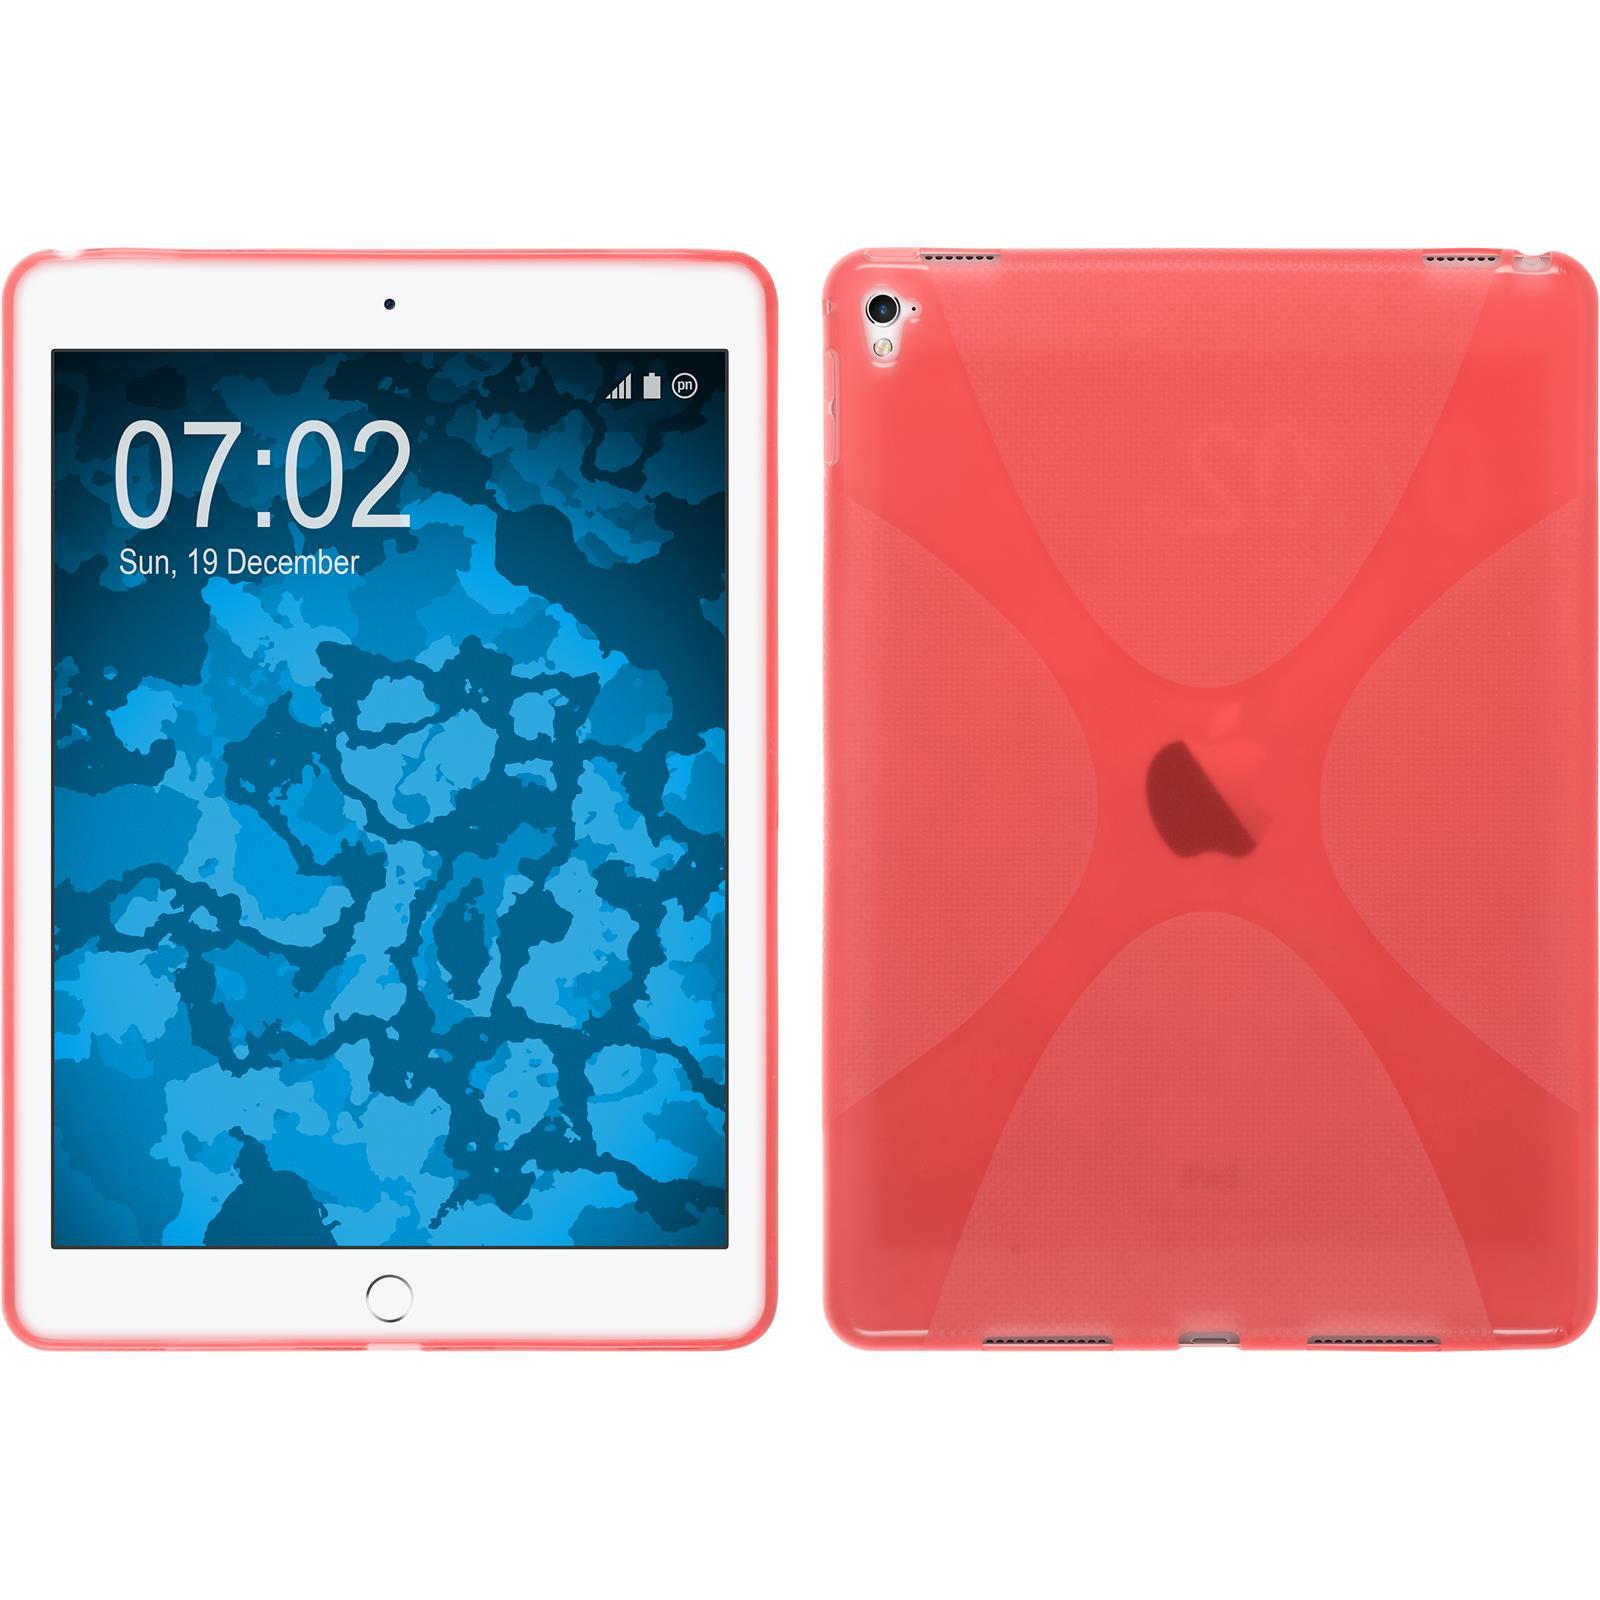 Funda-de-silicona-Apple-iPad-Pro-9-7-X-Style-protector-de-pantalla